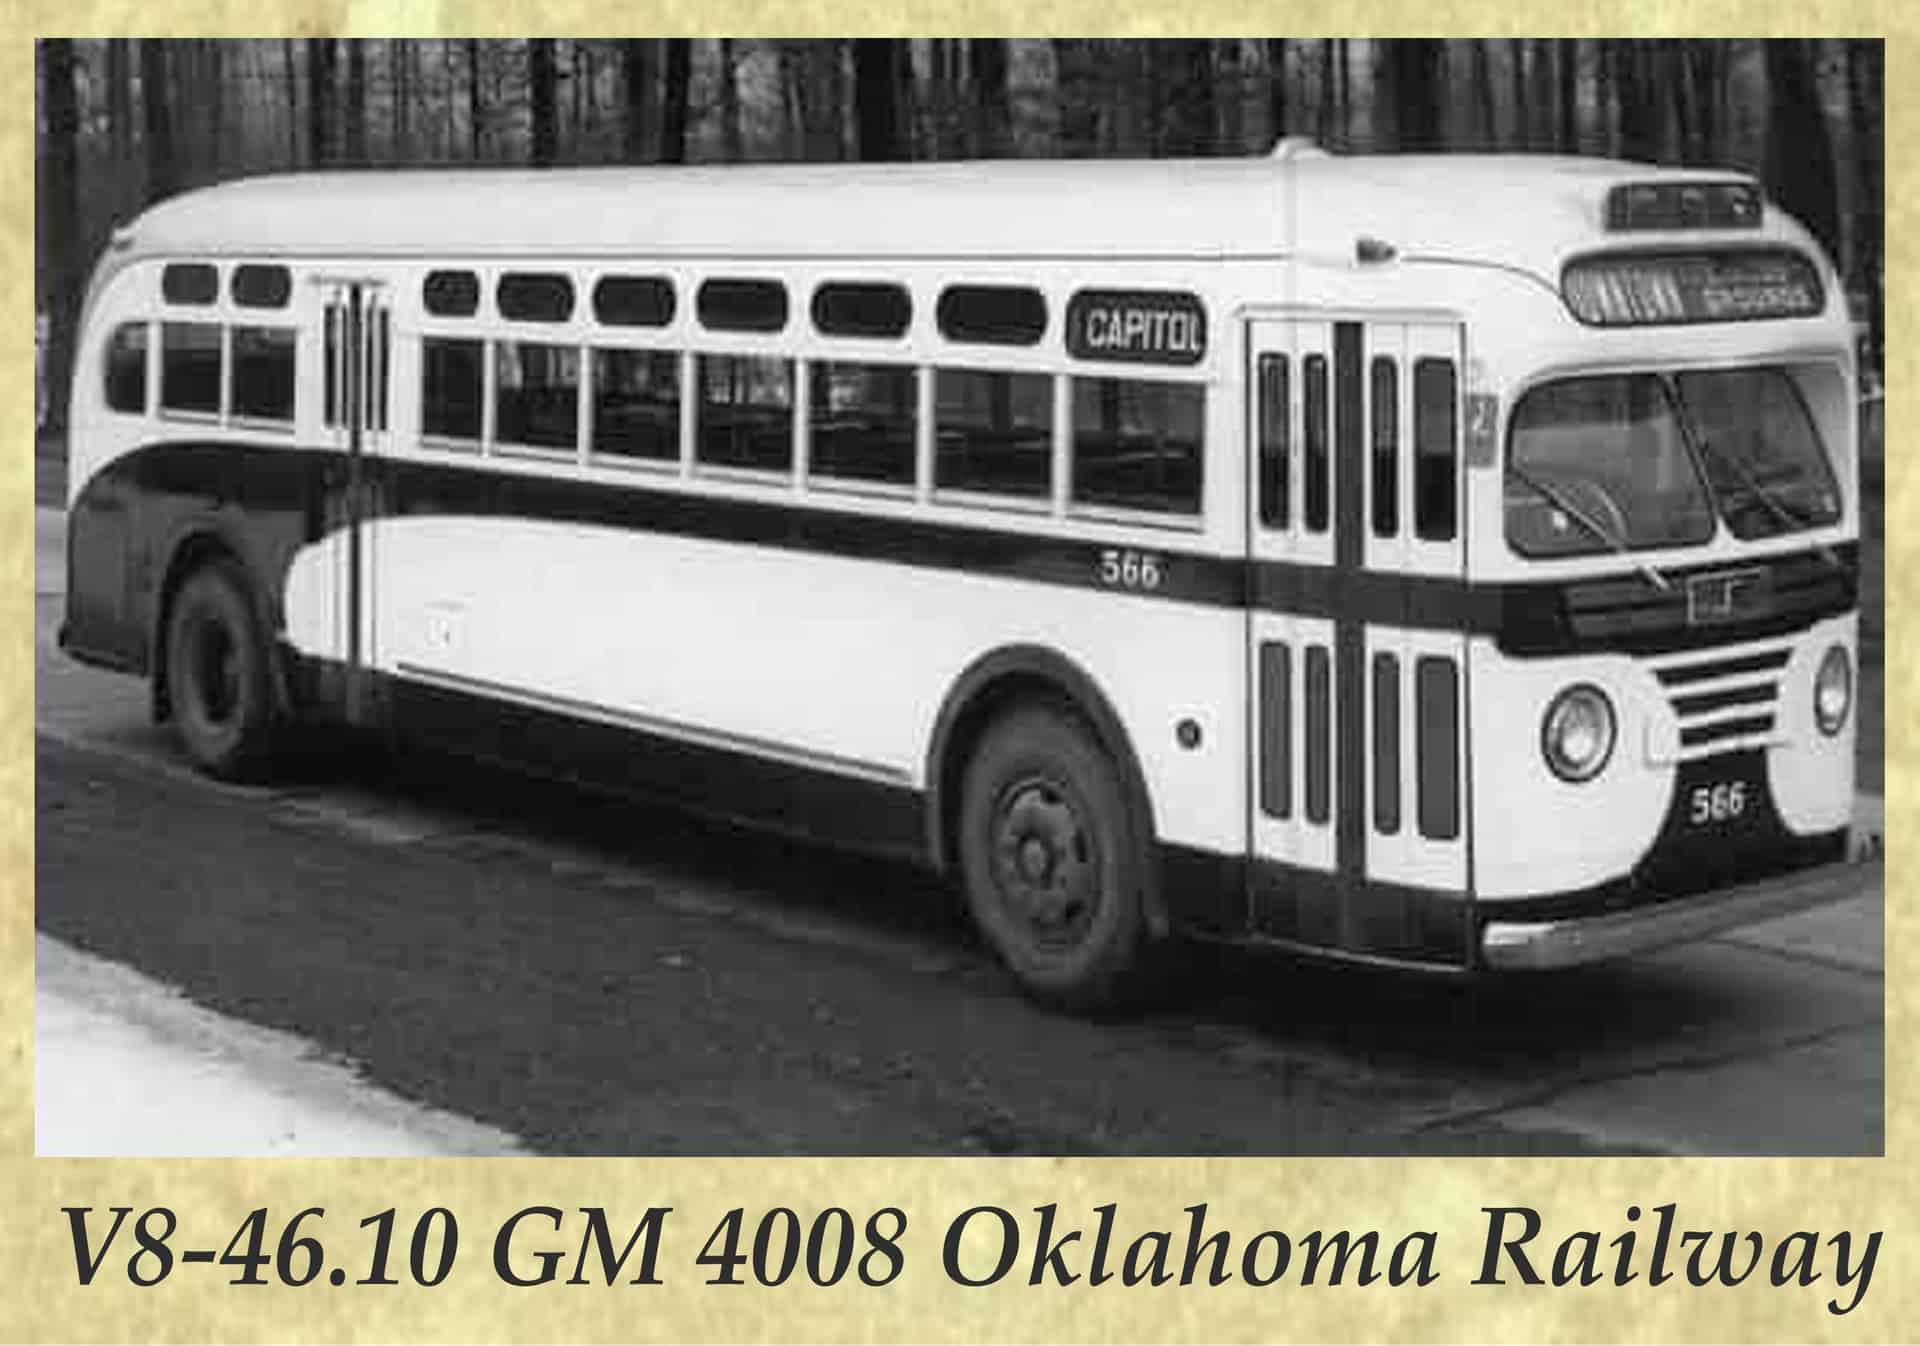 V8-46.10 GM 4008 Oklahoma Railway